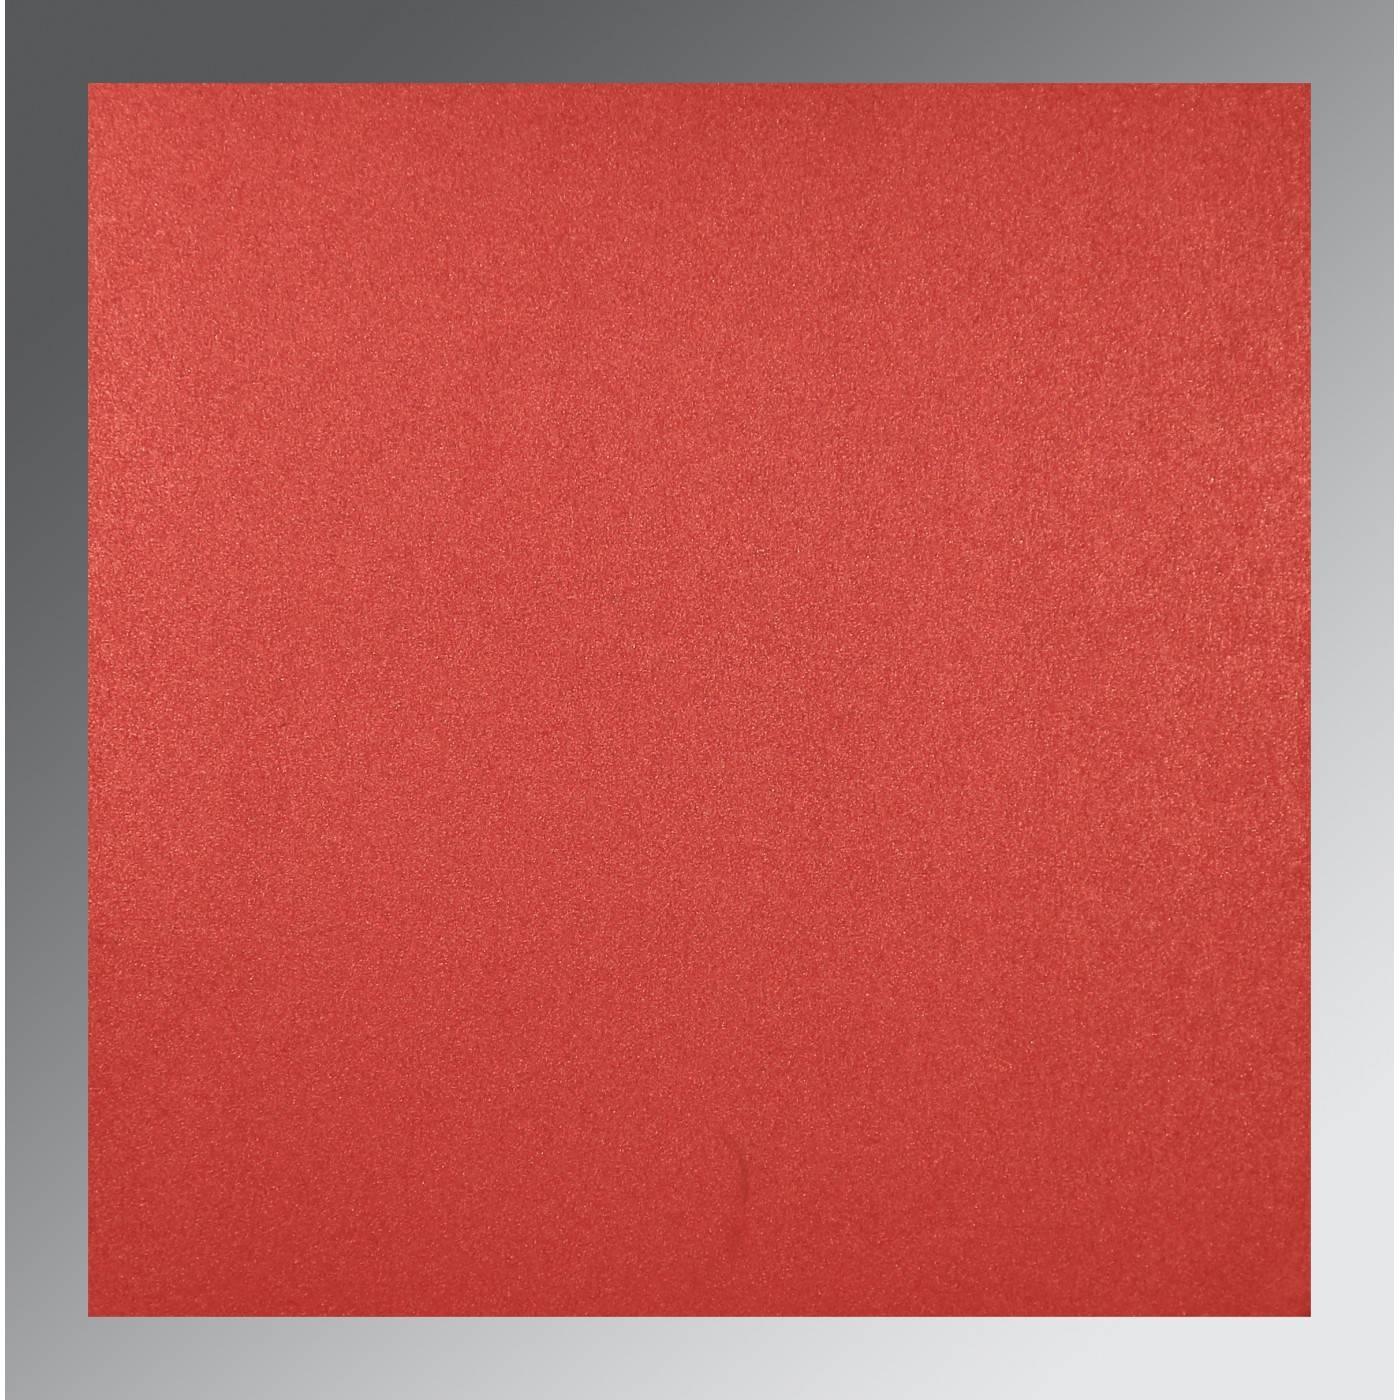 GOLD RED SHIMMERY DAMASK THEMED - LASER CUT WEDDING INVITATION : CRU-1494 - IndianWeddingCards